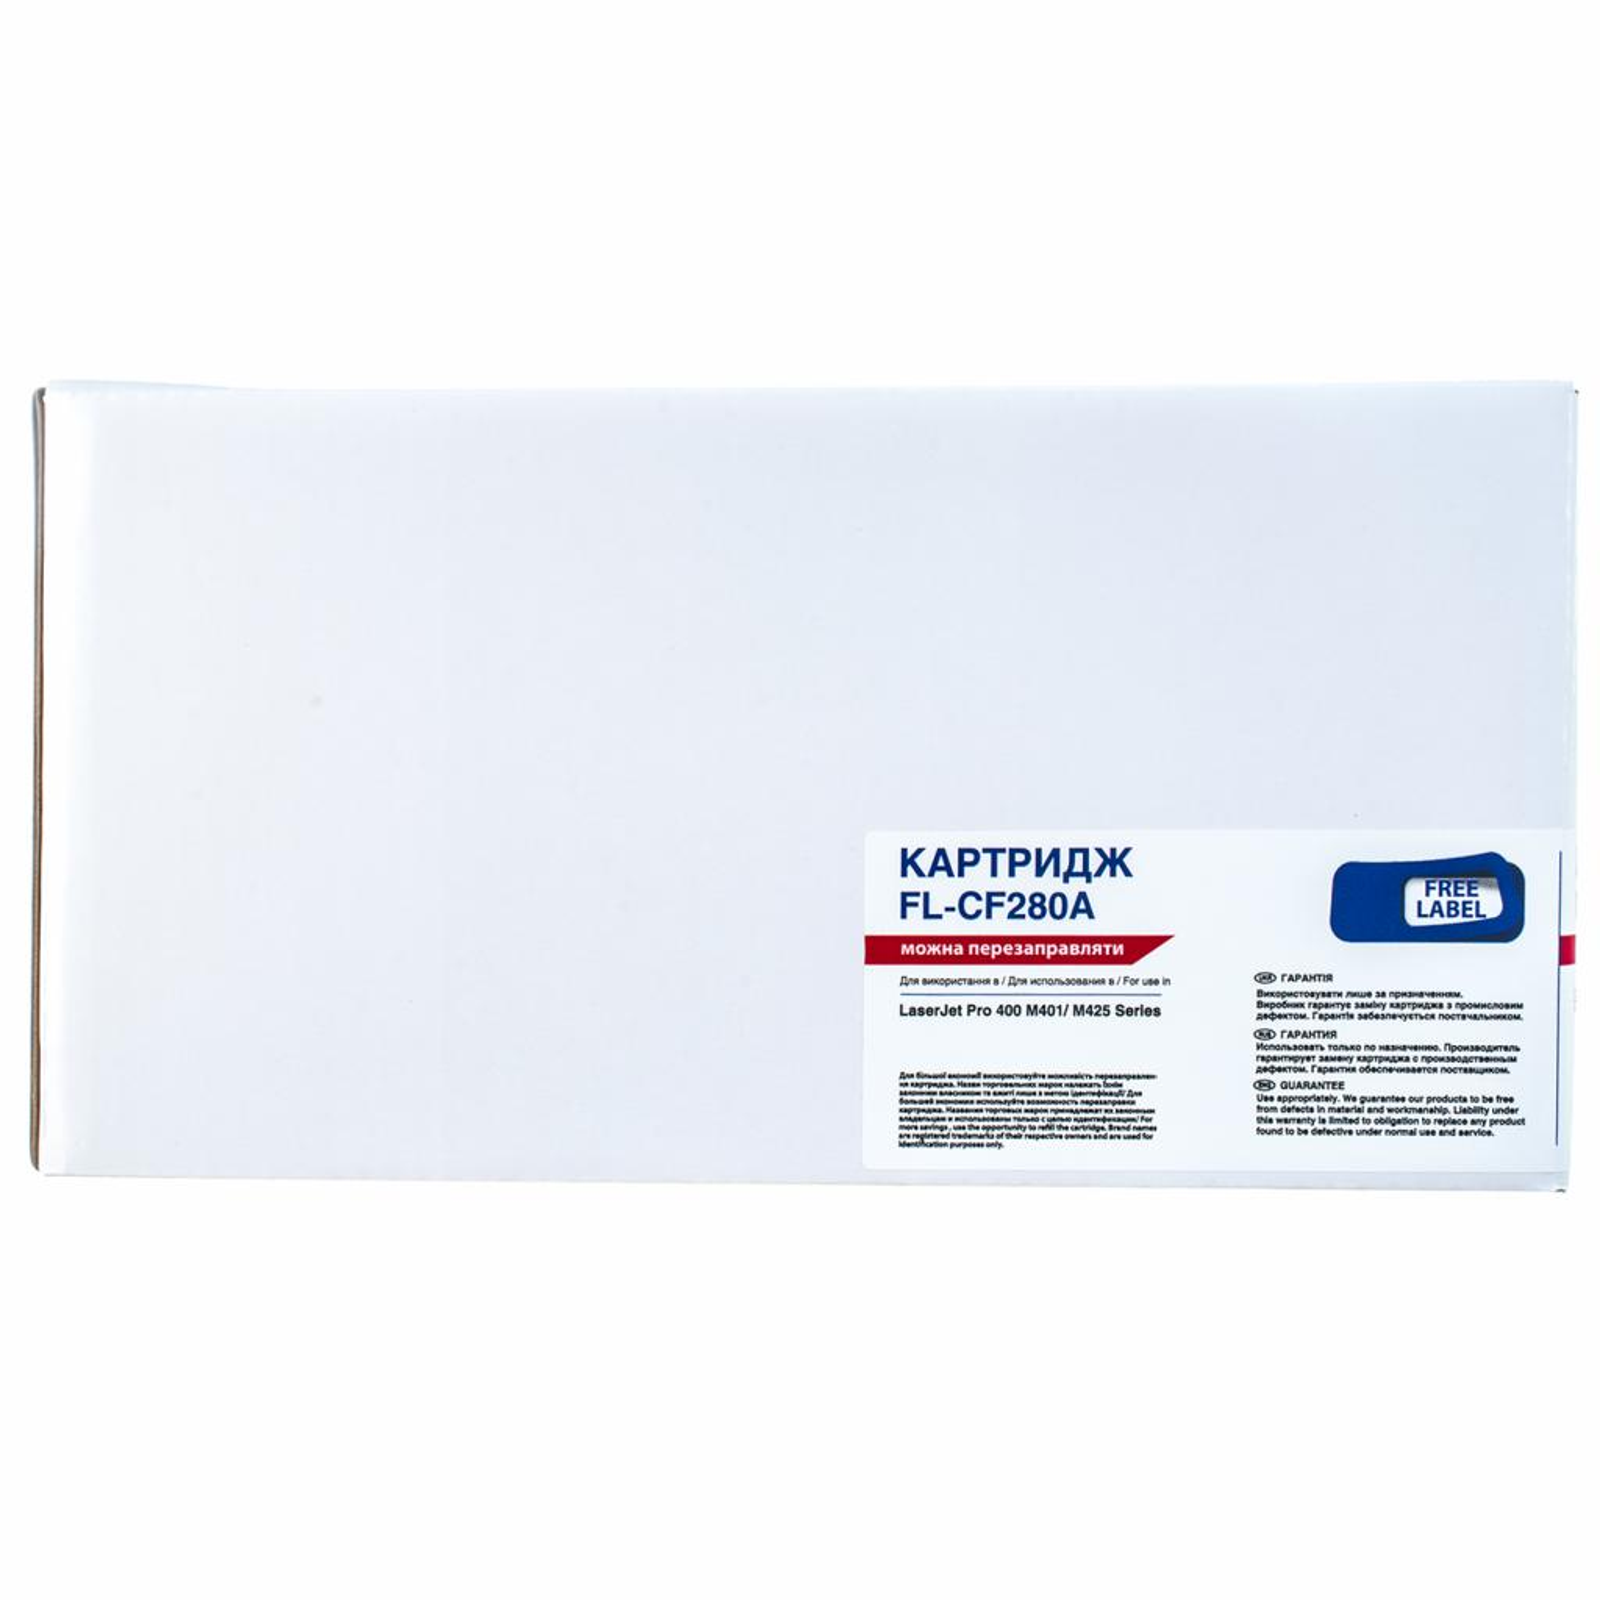 Картридж FREE Label HP LJ CF280A (для LJ Pro 400 M401/ M425) (FL-CF280A) изображение 2